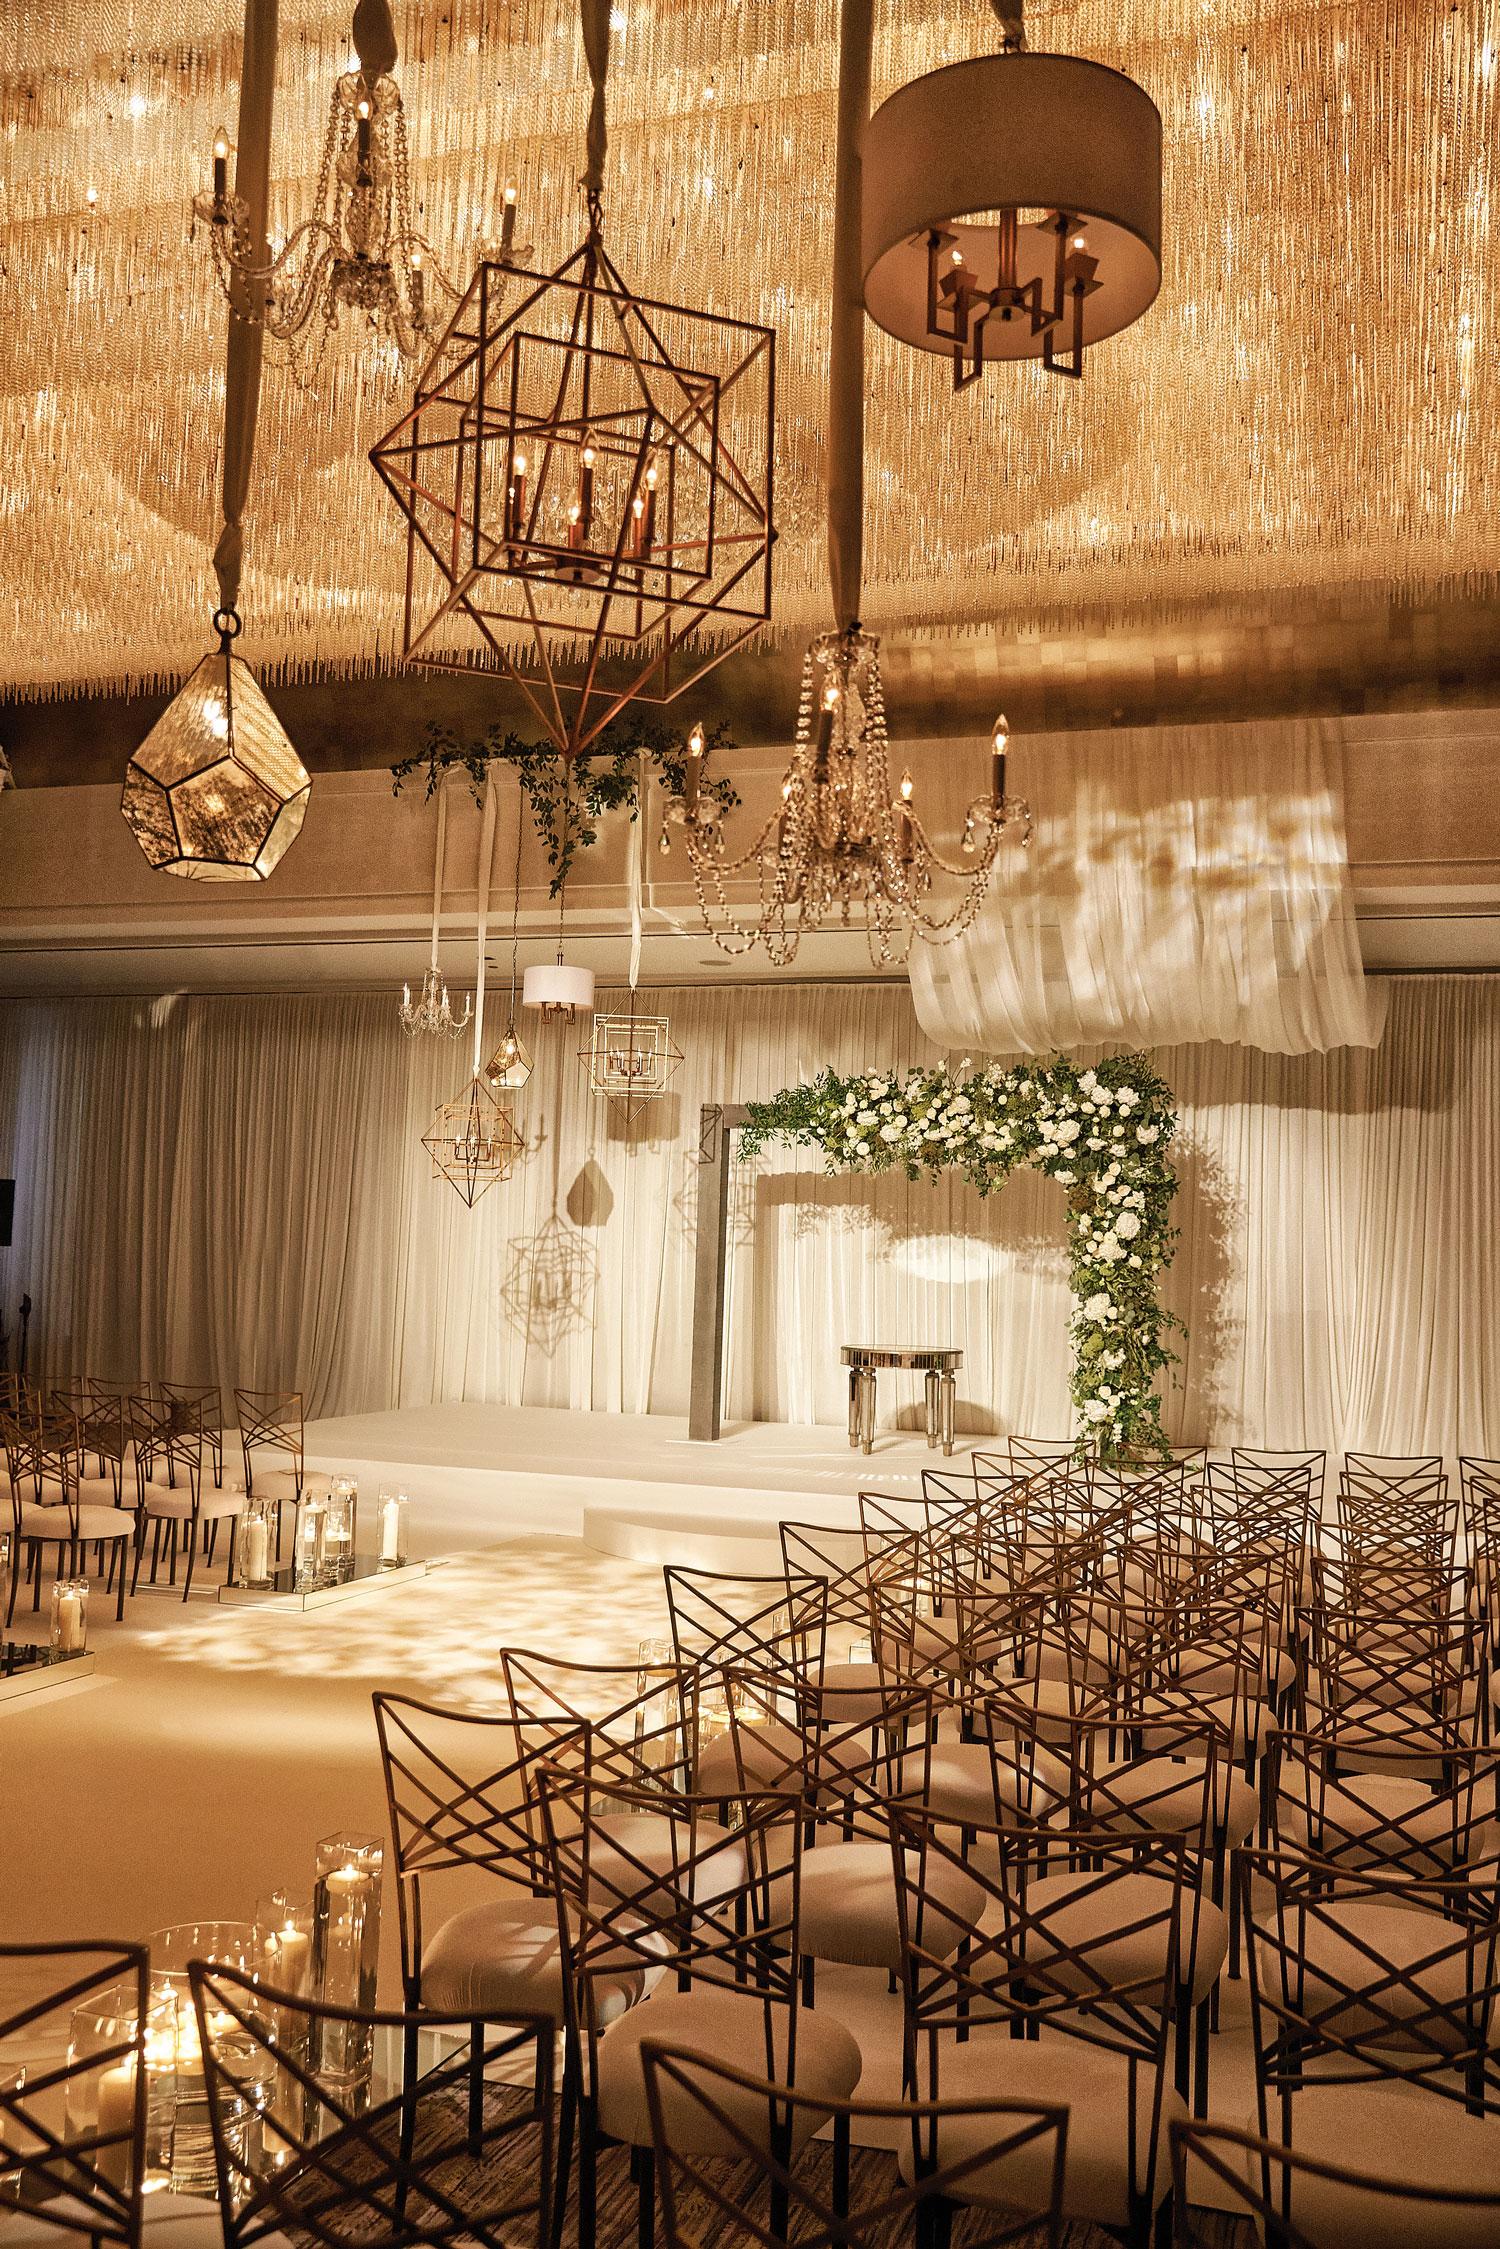 Inside Weddings Summer 2018 issue preview wedding ceremony ballroom terrarium